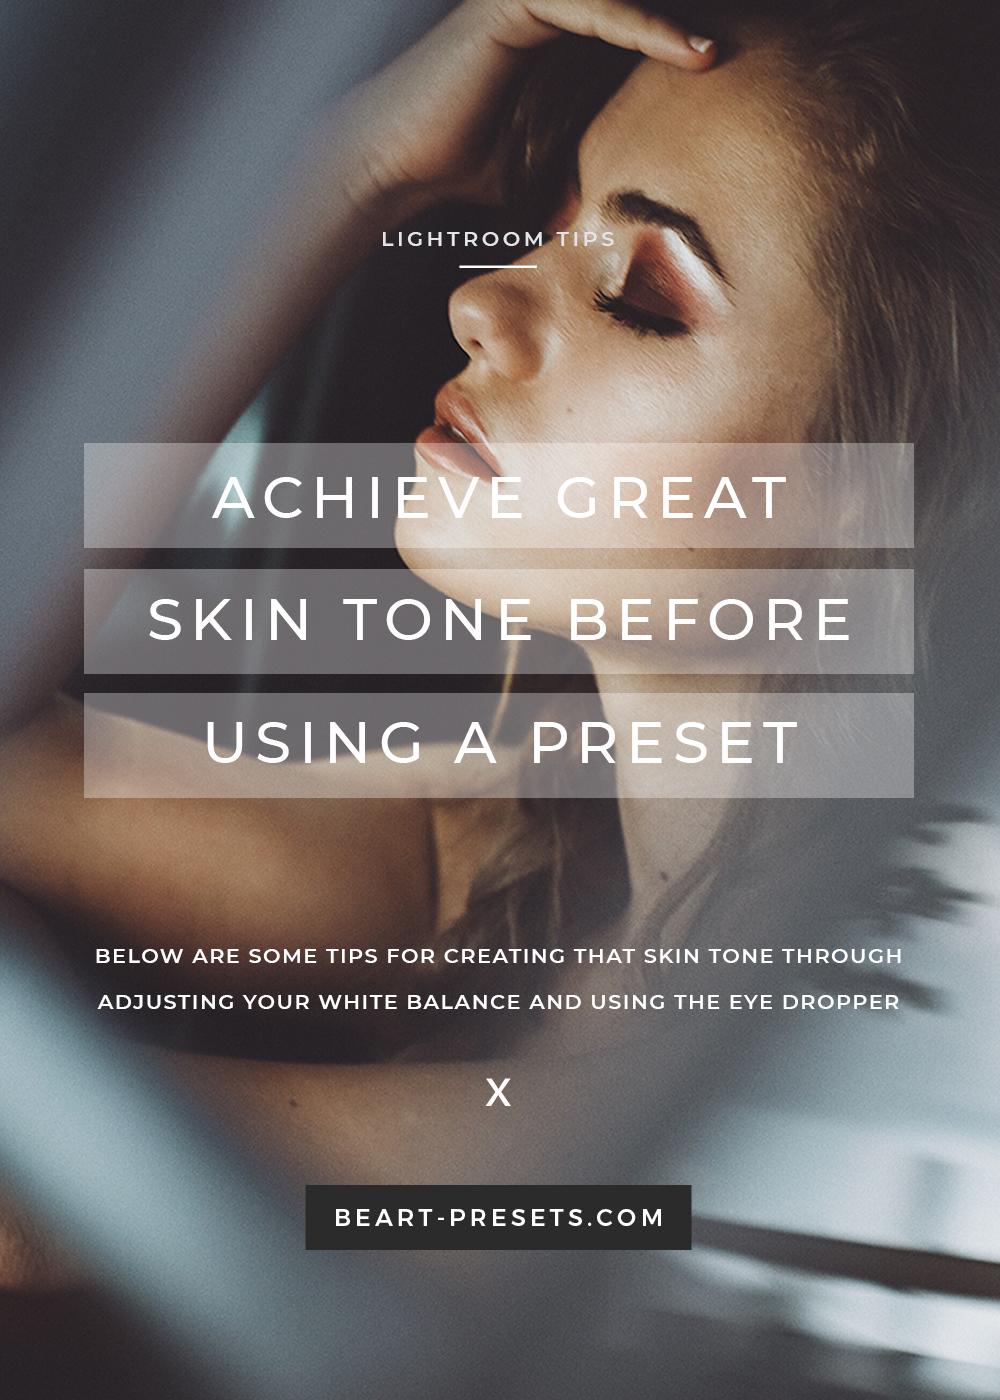 Achieve-great-skin-tone-before-using-a-preset